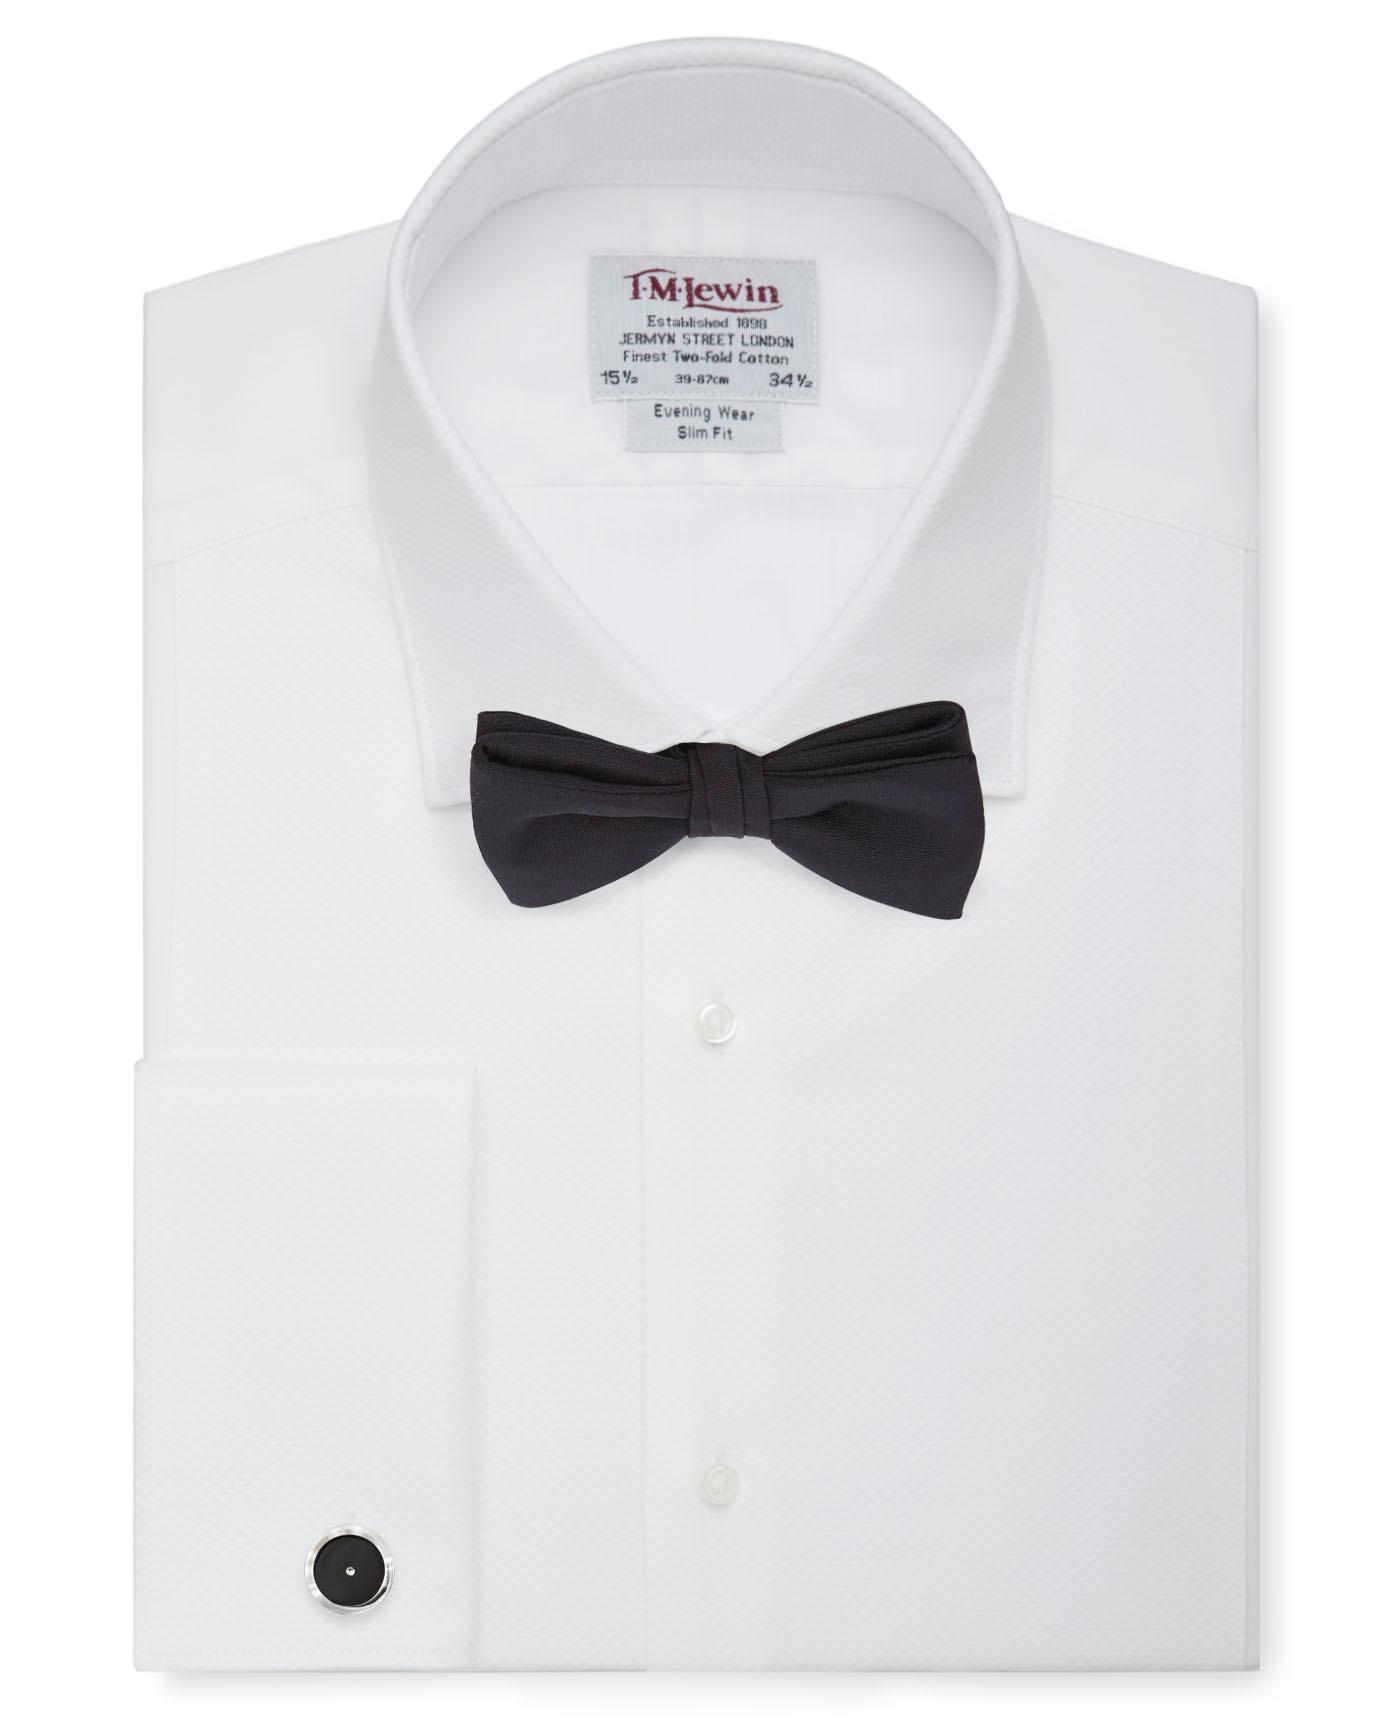 Marcella Slim Fit Evening Dress Shirt Reviews Tm Lewin Reviews Feefo